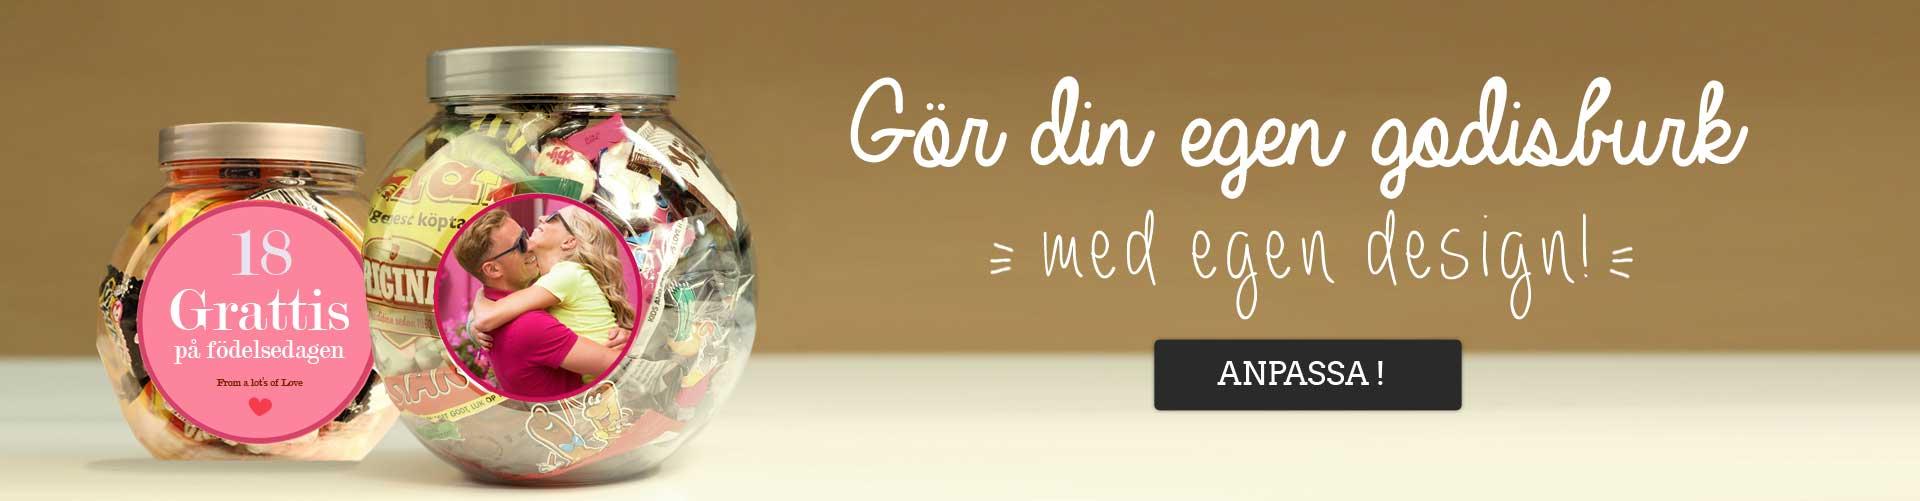 godis online